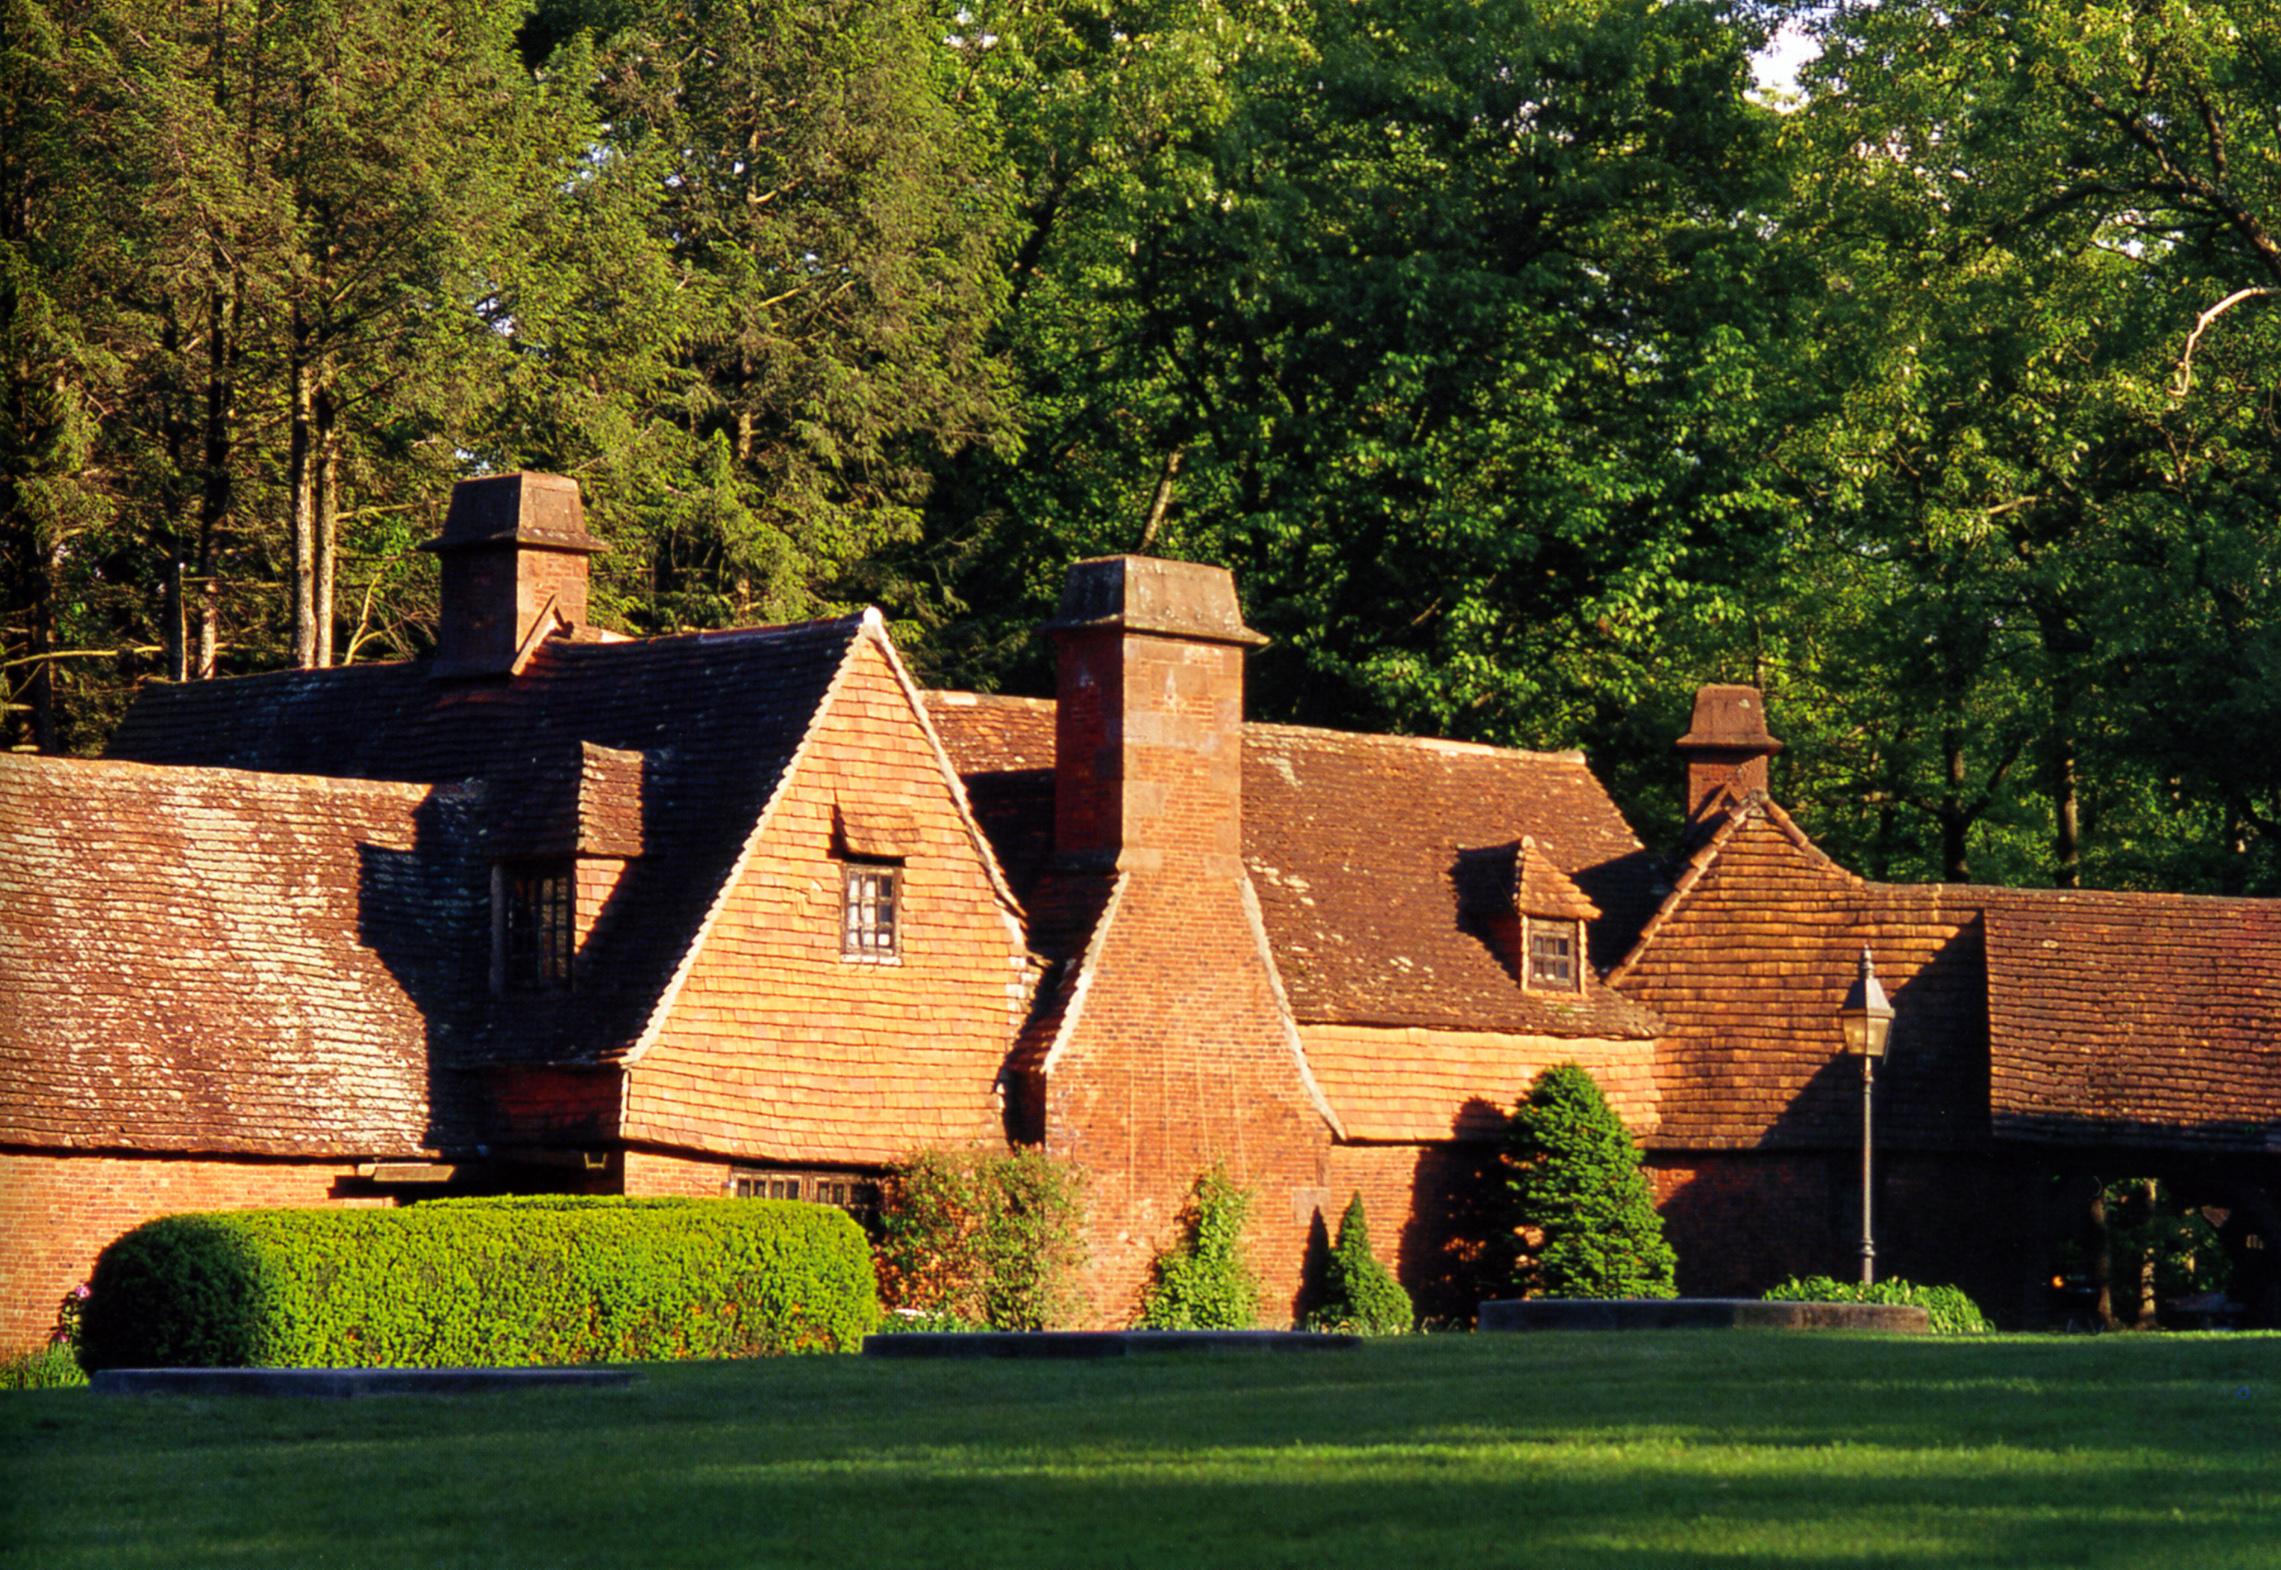 Cottage at entry.jpg